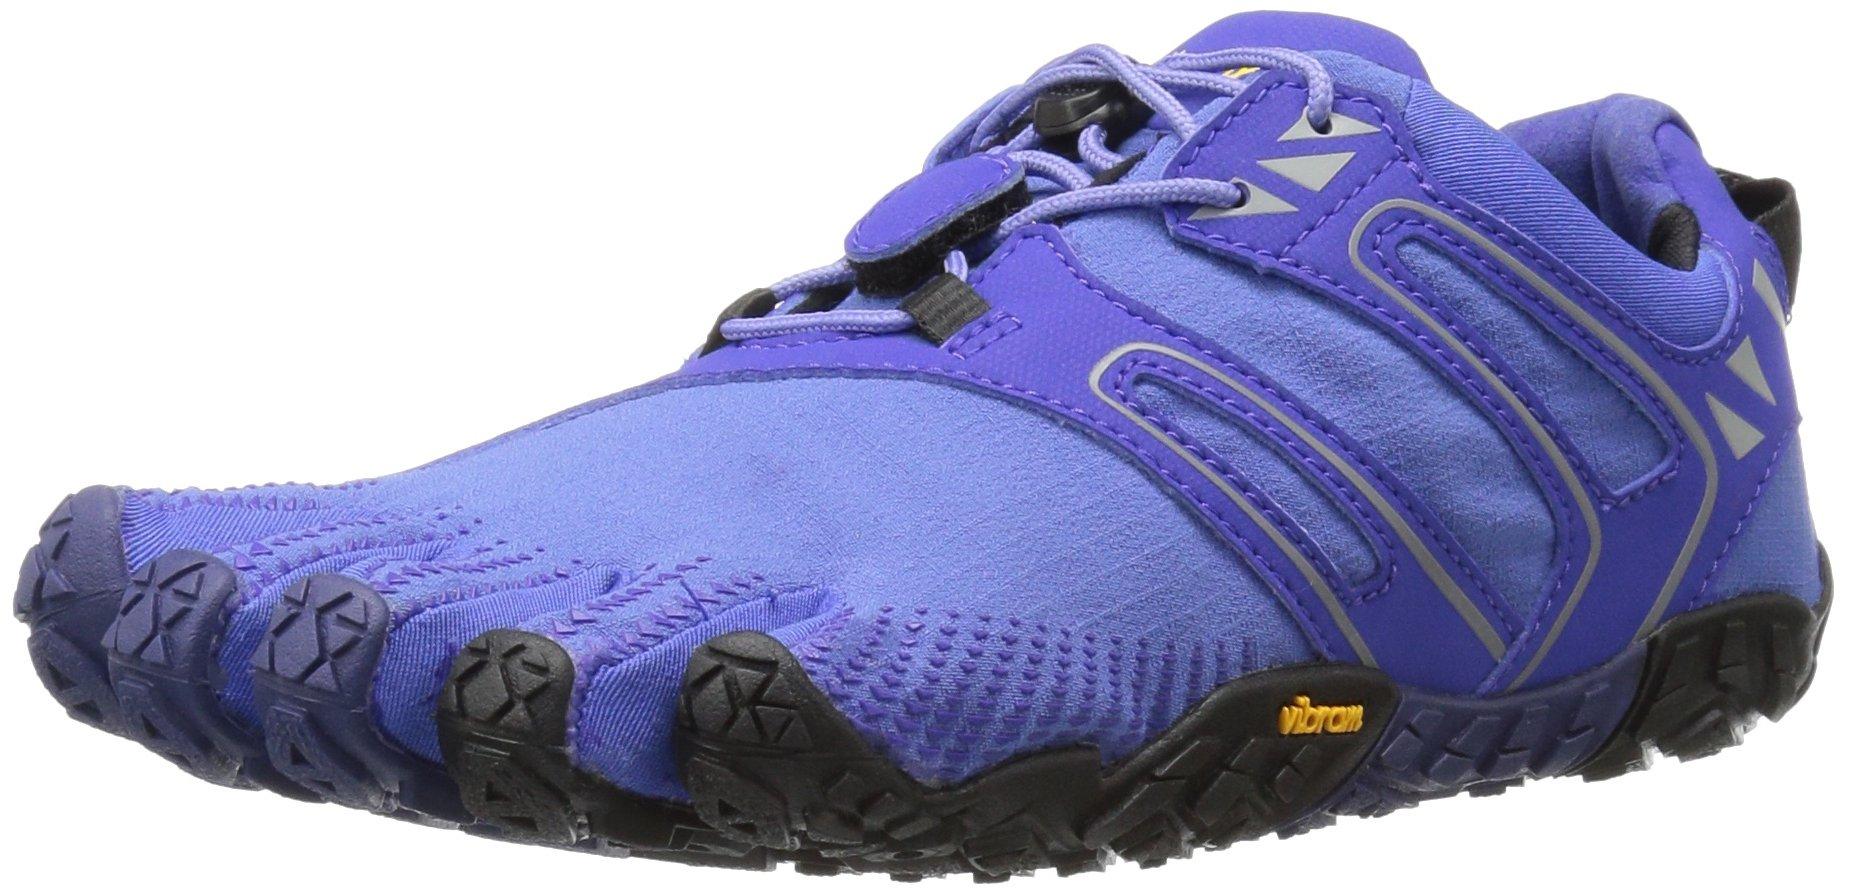 Vibram Women's V Trail Runner Purple/Black 36 EU/6 M US